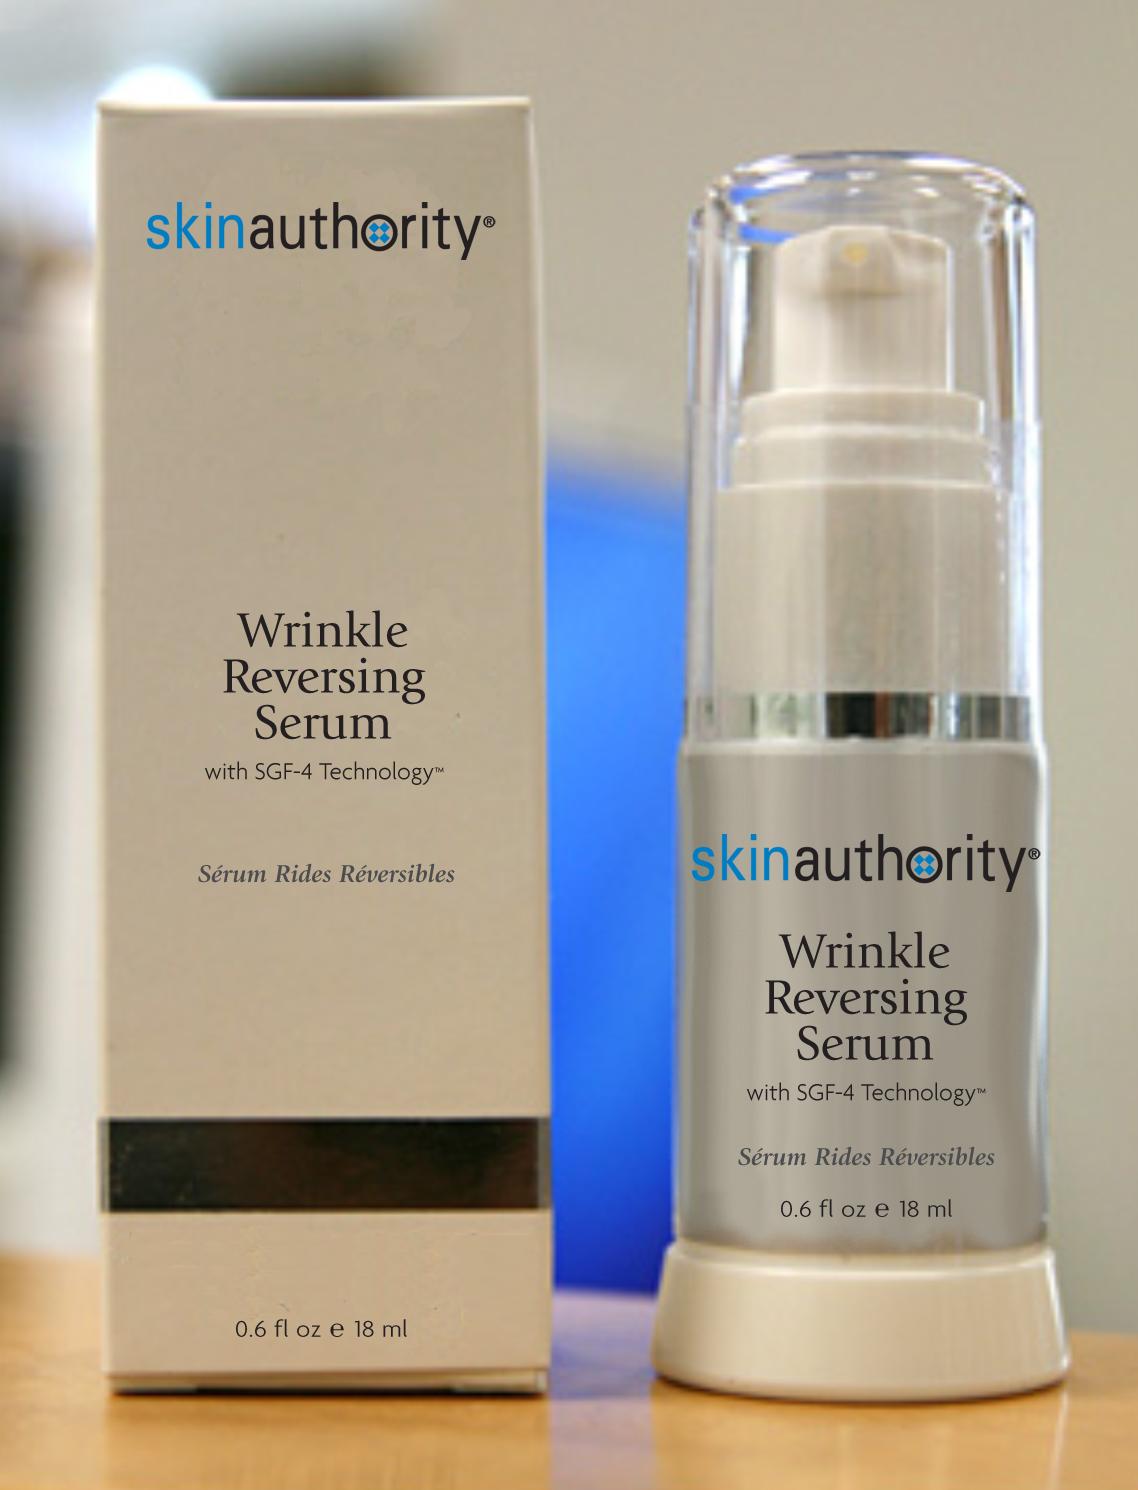 Wrinkle Reversing Serum with SGF-4 Technology, 0.6 oz / 18 ml   $125